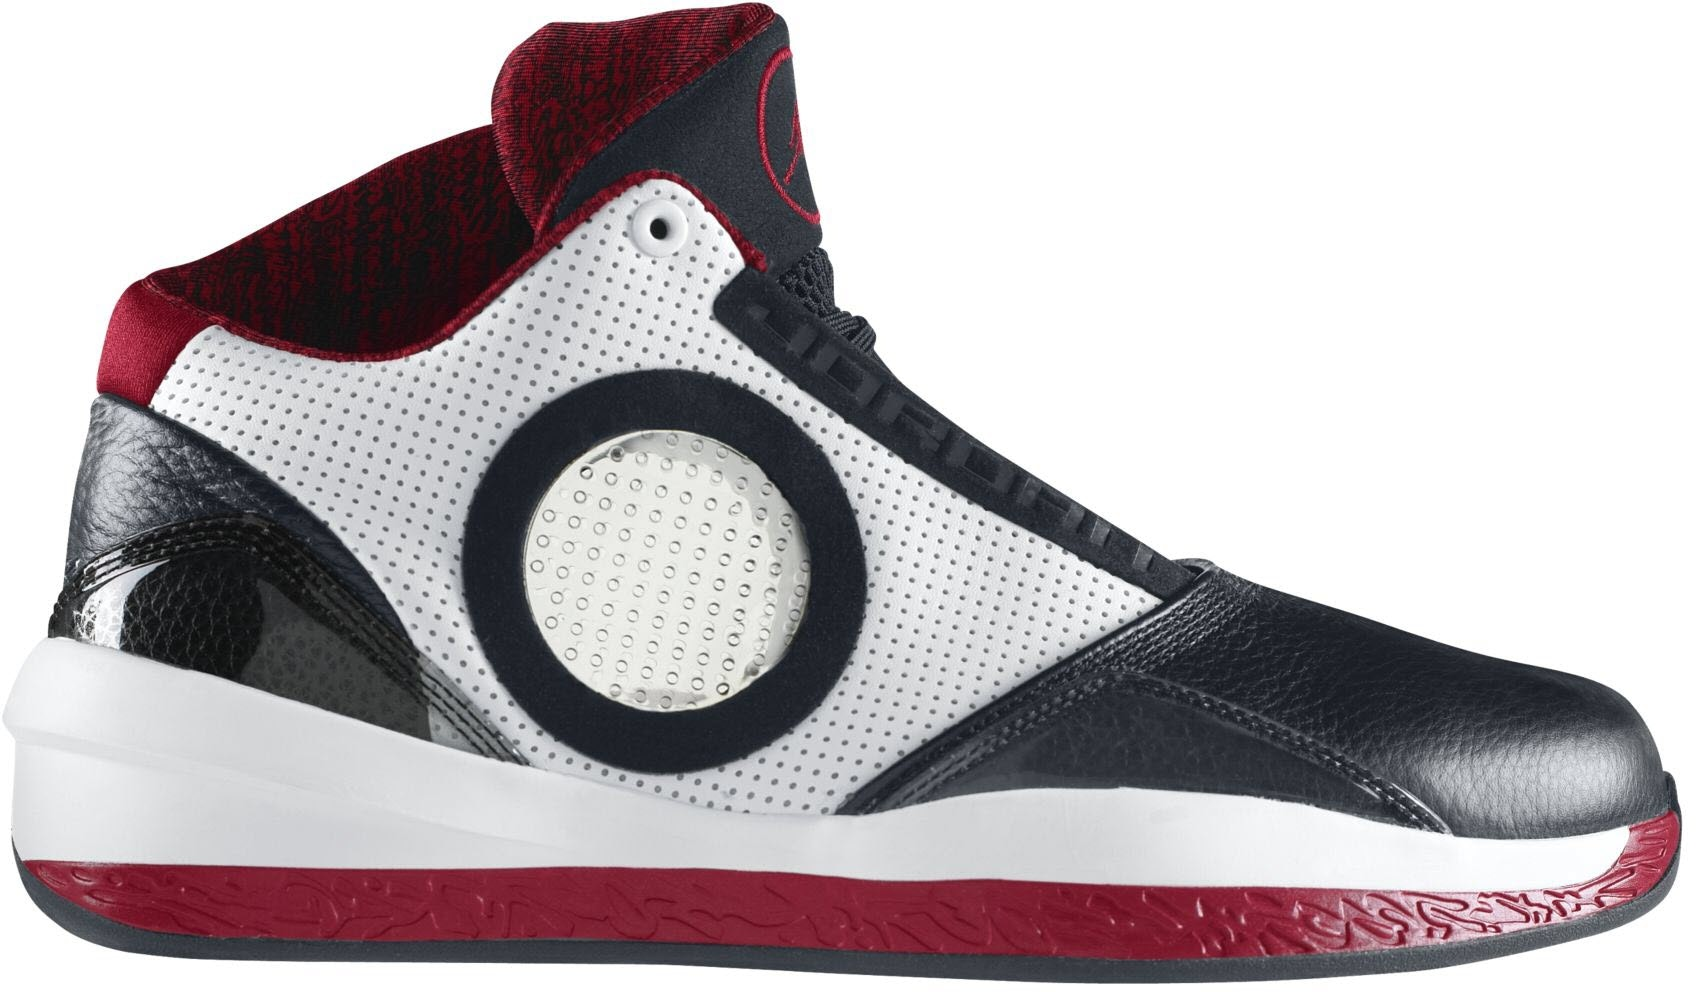 Jordan 2010 Black Varsity Red